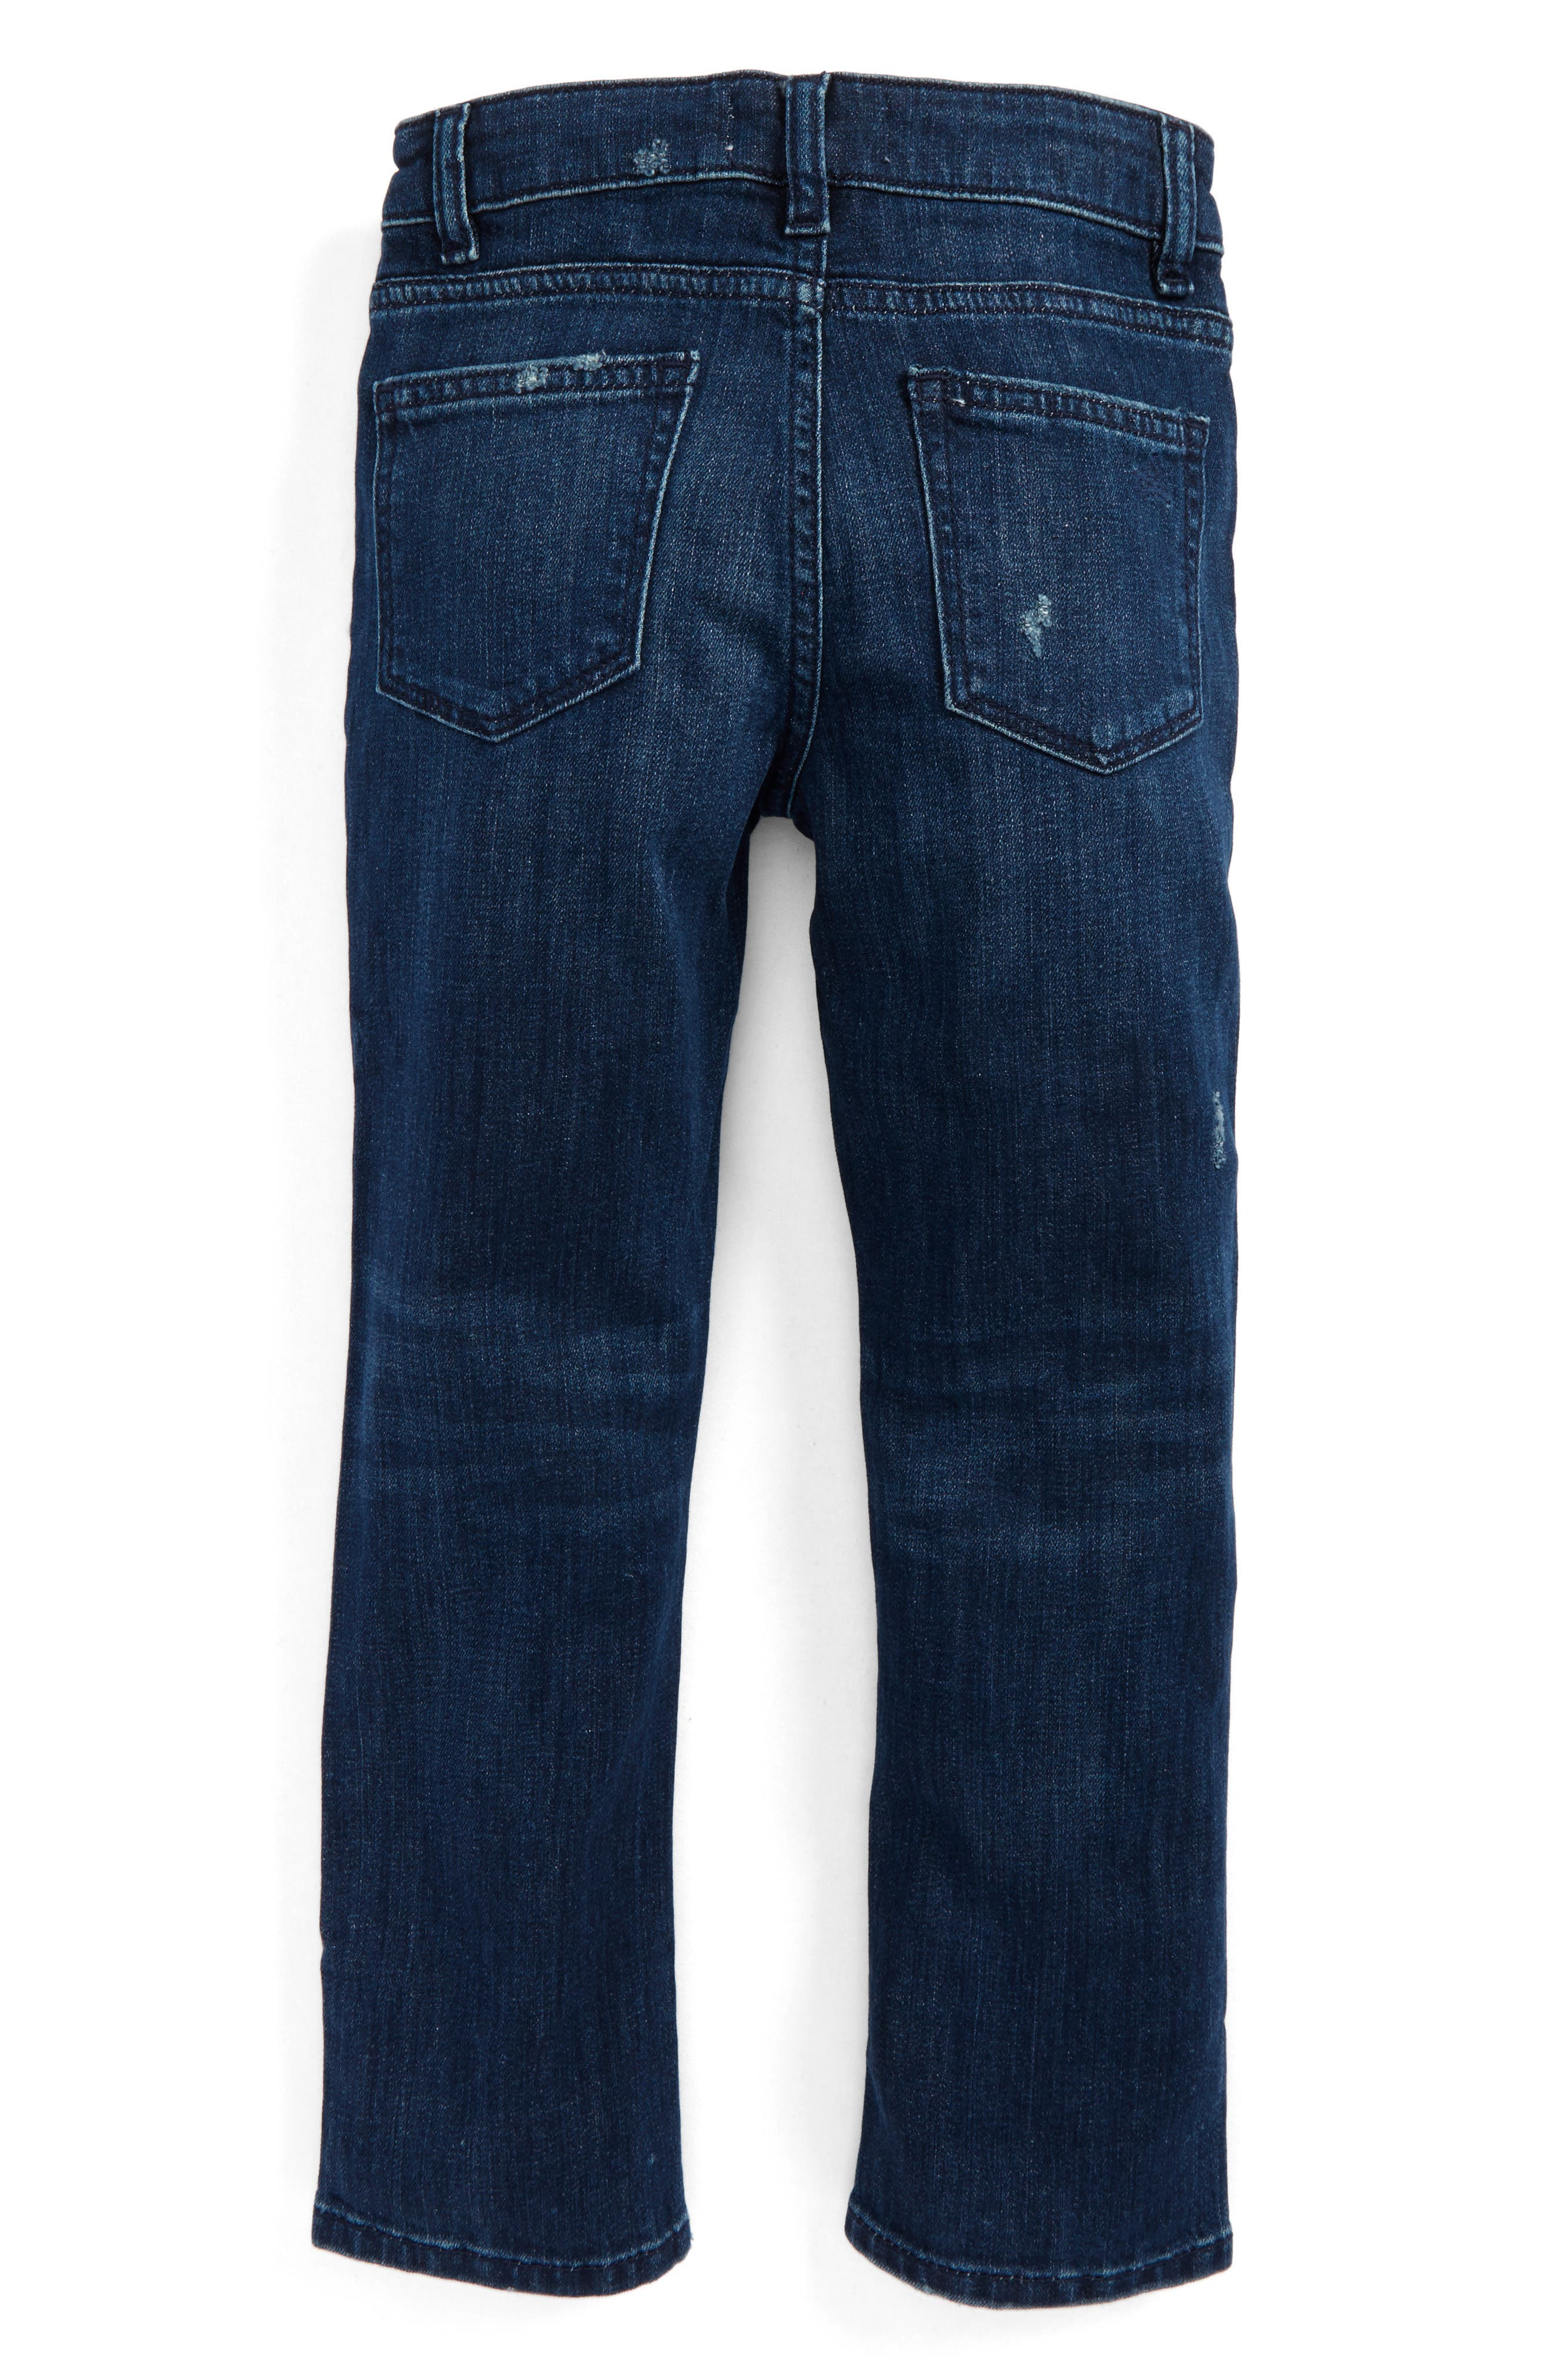 Alternate Image 2  - DL1961 Brady Slim Fit Jeans (Toddler Boys & Little Boys)